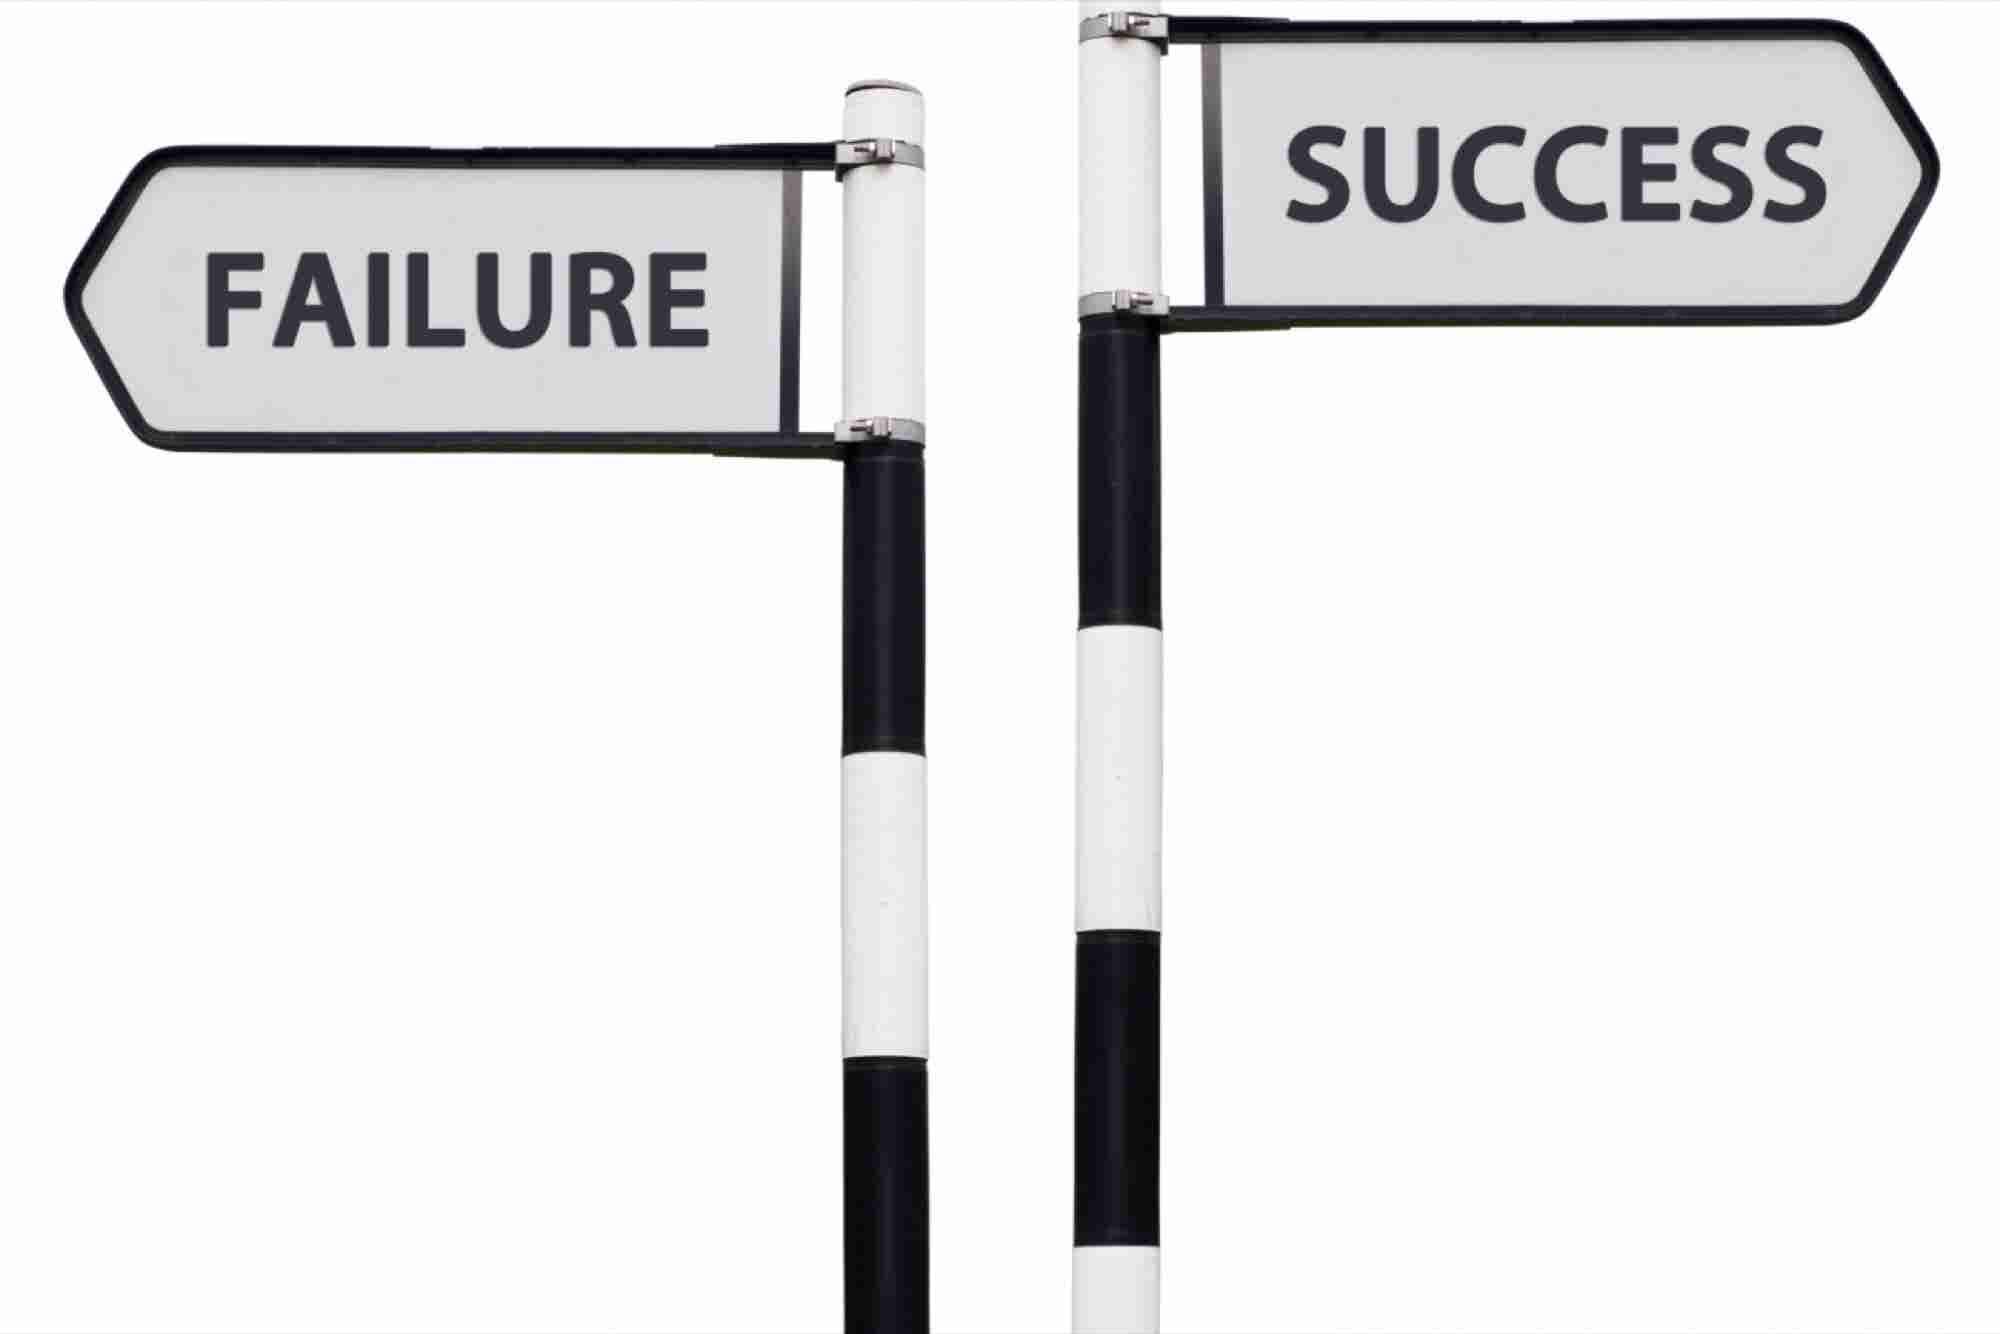 15 Traits of Failing Entrepreneurs You Should Avoid